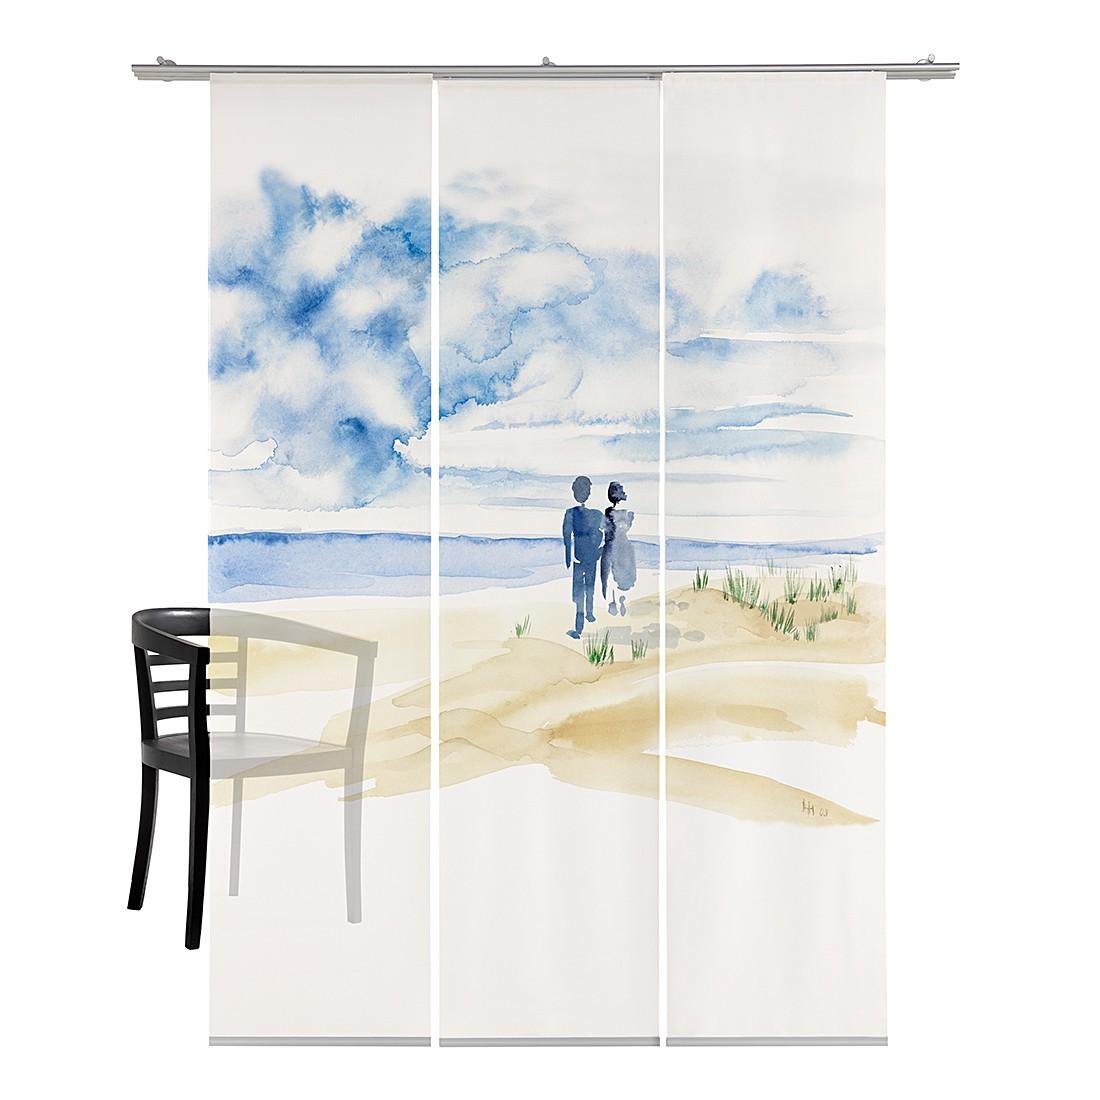 fl chenvorhang l wenzahn hell emotion textiles g nstig kaufen. Black Bedroom Furniture Sets. Home Design Ideas